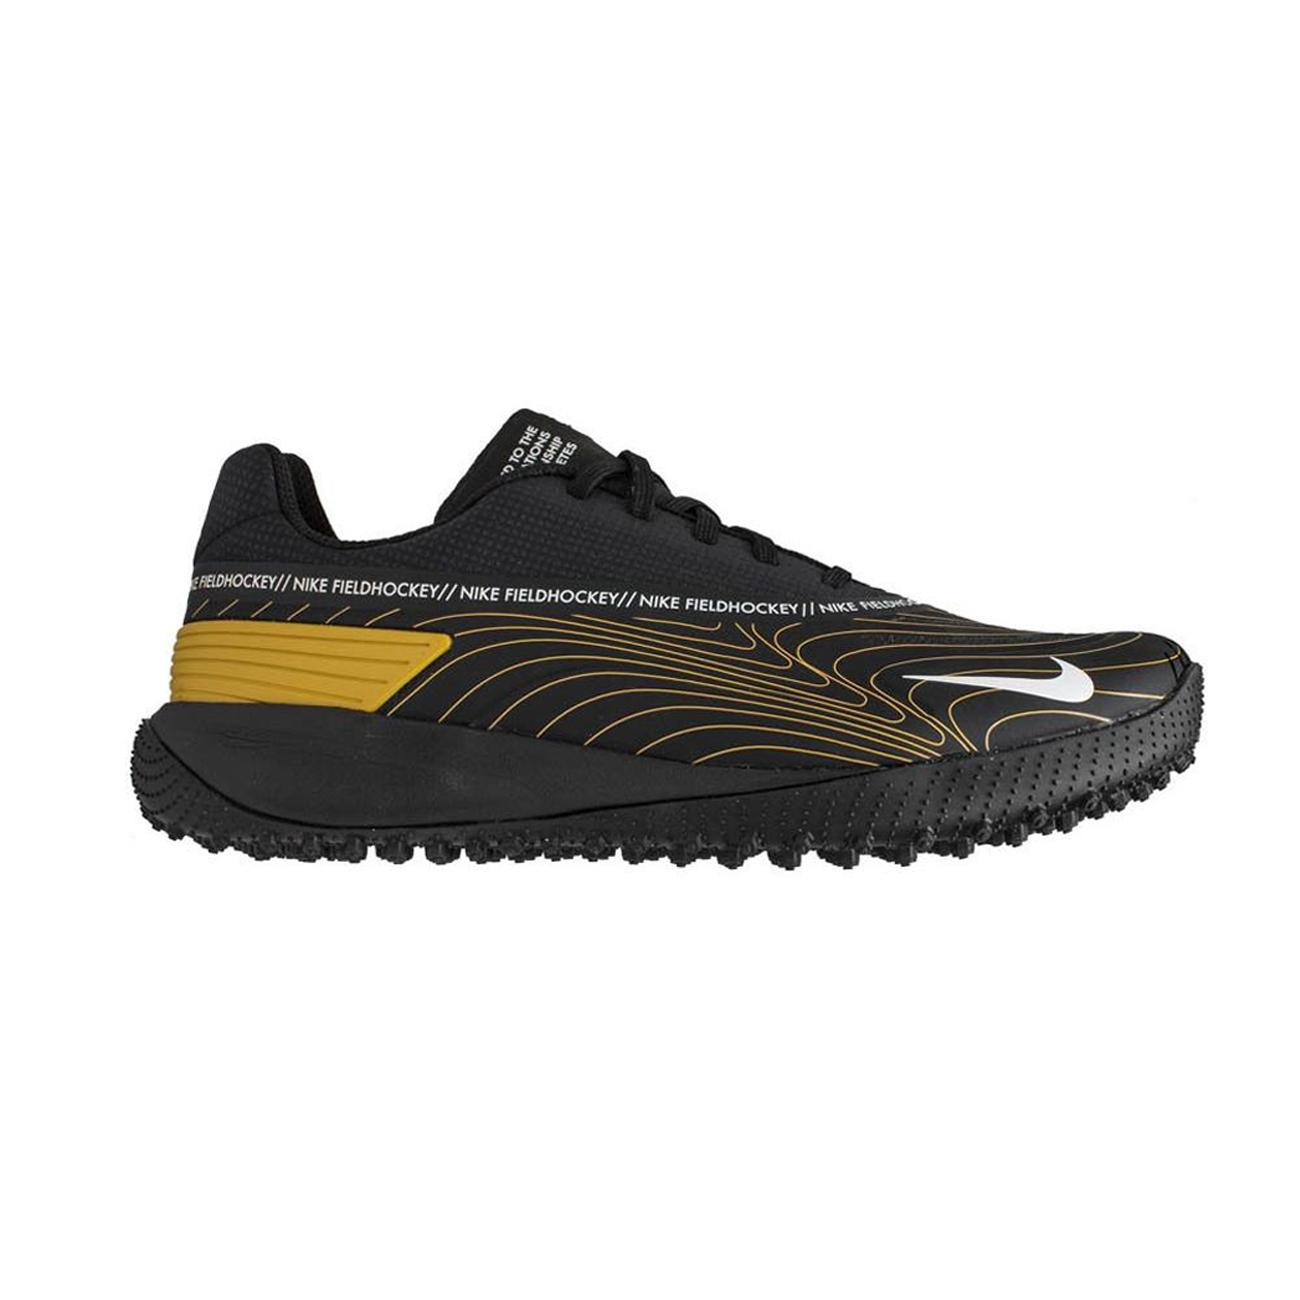 Nike Hockey Shoes - Nike Vapor Drive black